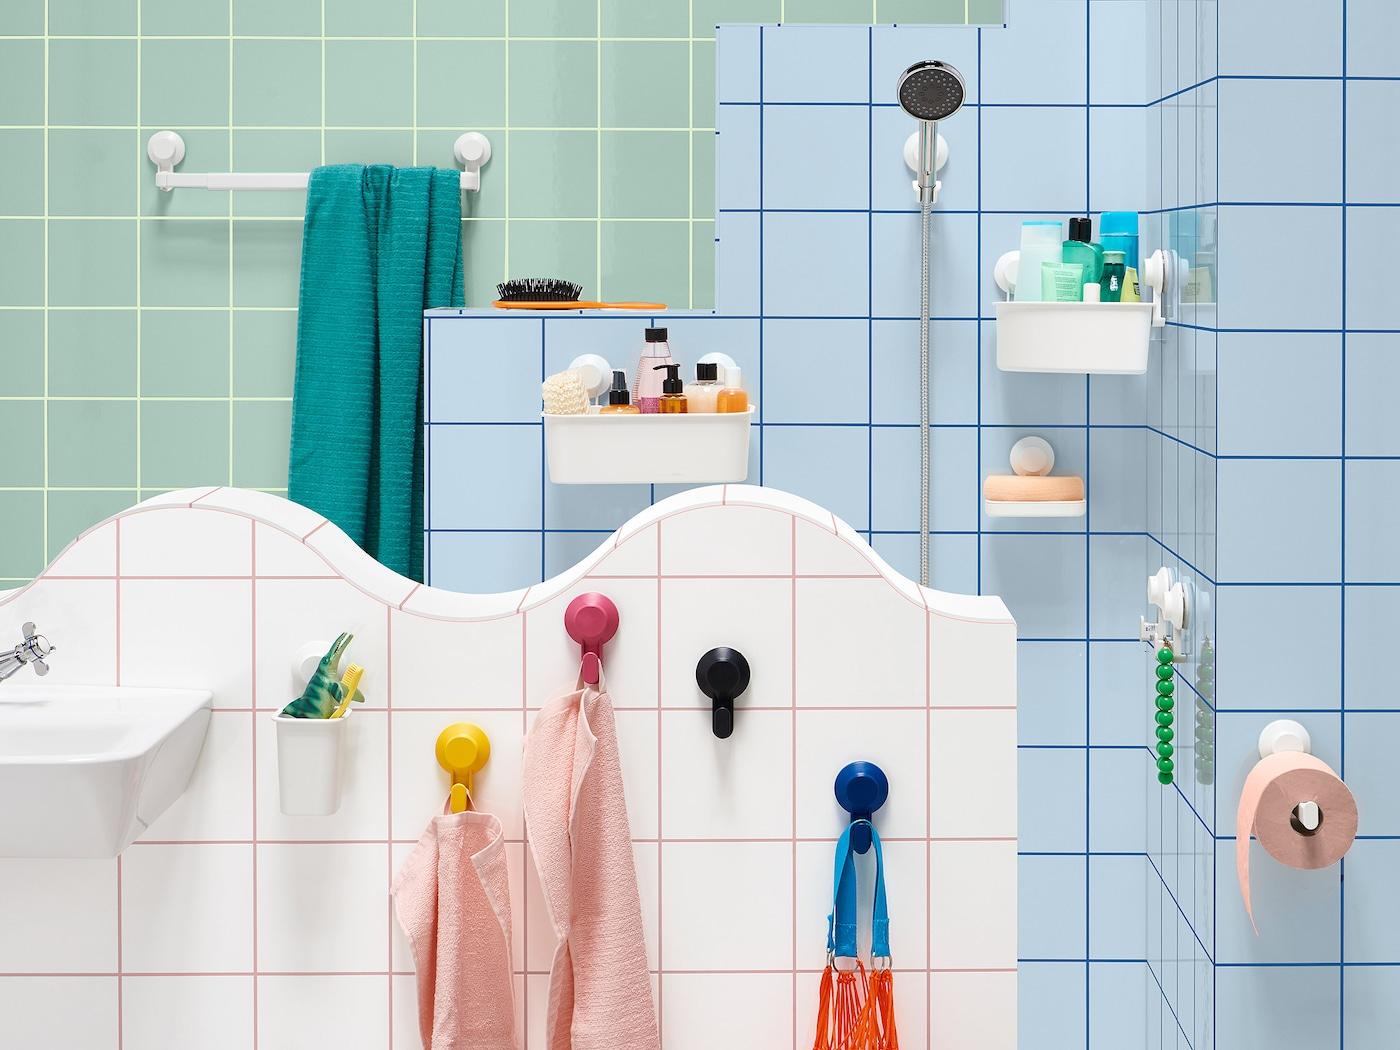 Badezimmer mit blauen, weissen & grünen Fliesen & bunten Saugnäpfen, an denen Badutensilien hängen.